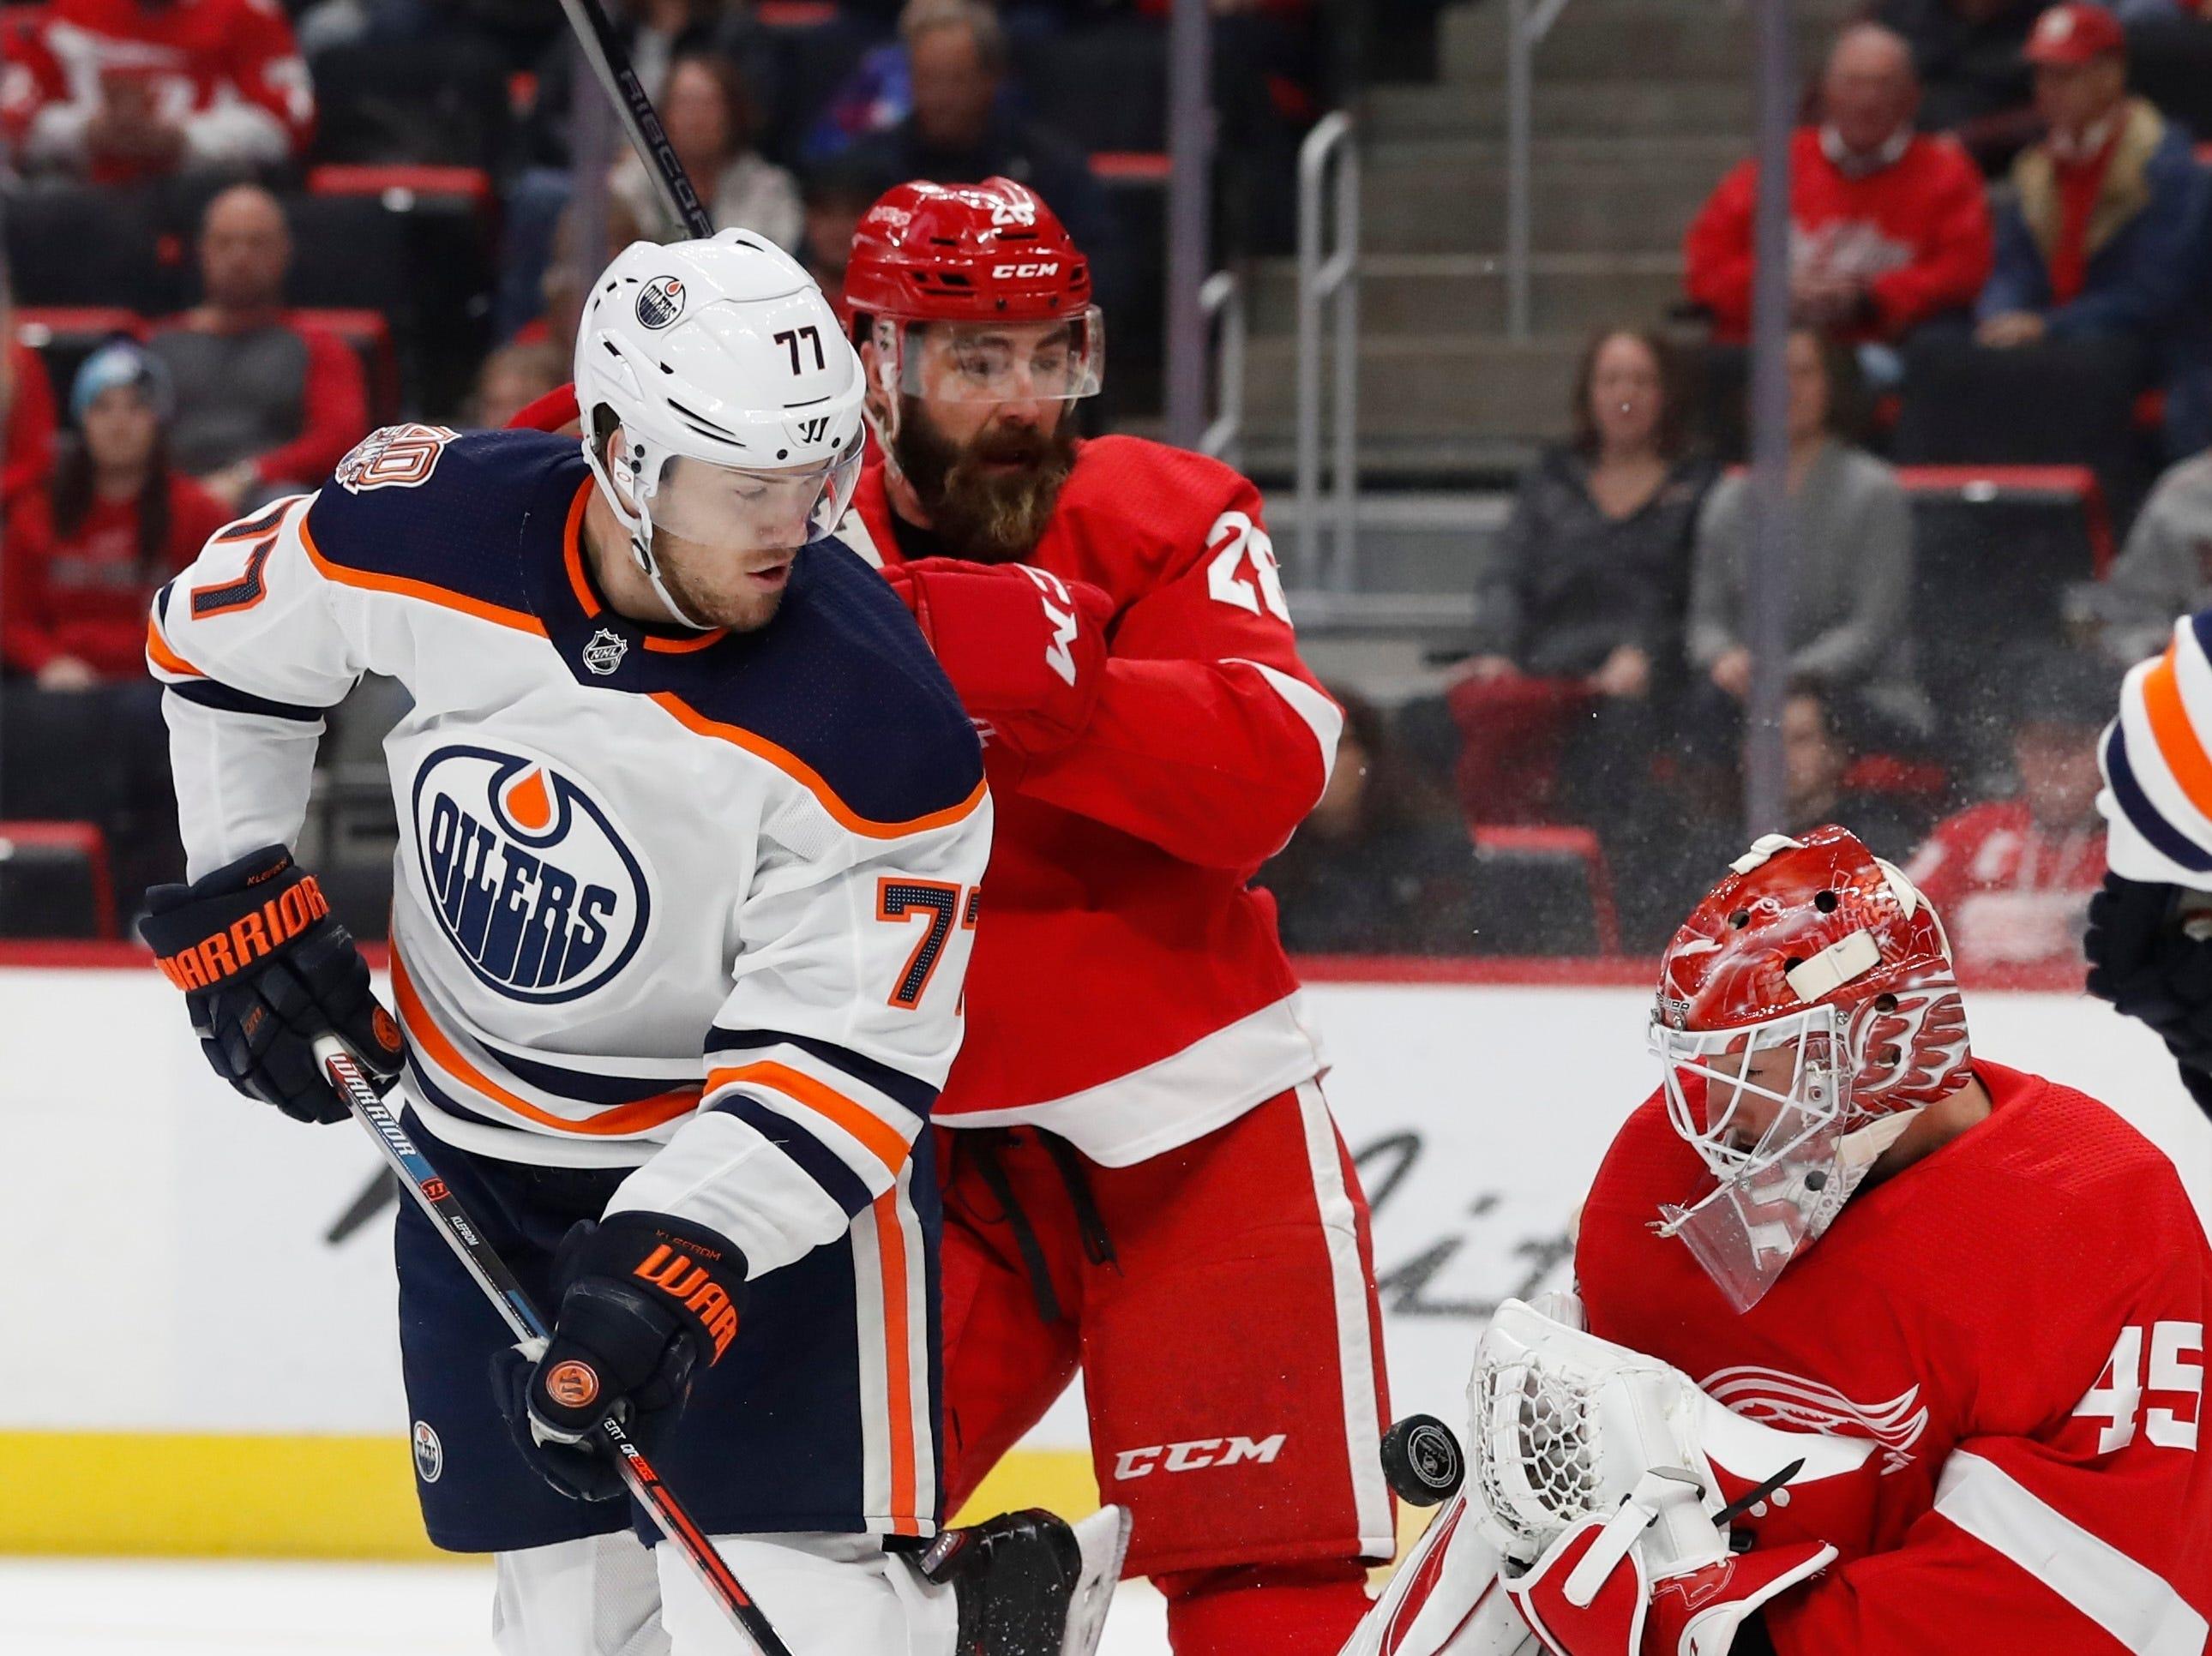 Detroit Red Wings goaltender Jonathan Bernier (45) stops a shot by Edmonton Oilers defenseman Oscar Klefbom (77) during the first period of an NHL hockey game, Saturday, Nov. 3, 2018, in Detroit. (AP Photo/Carlos Osorio)